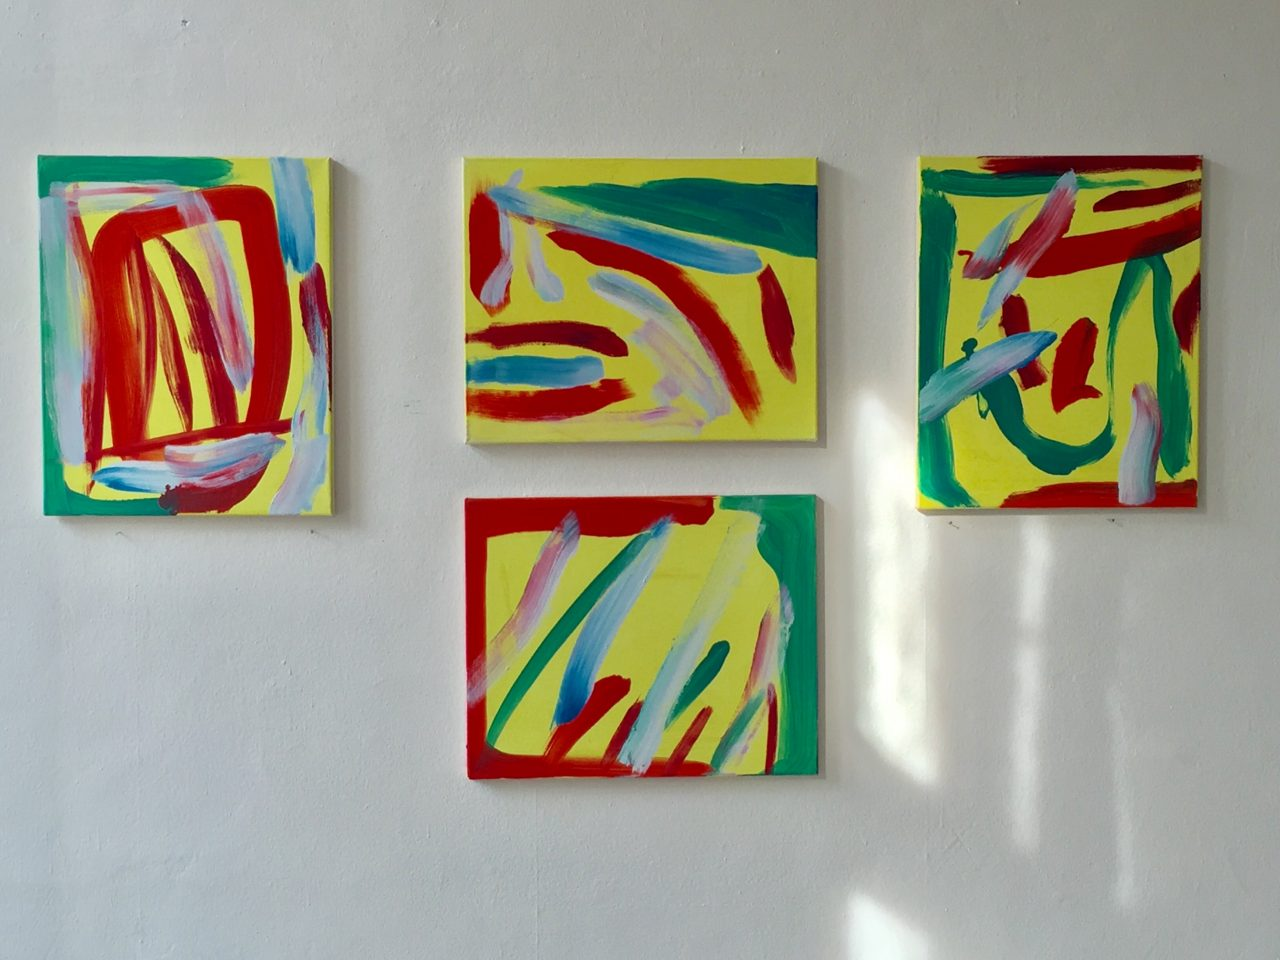 4 Bilder, je 50 x 40 cm, 2018